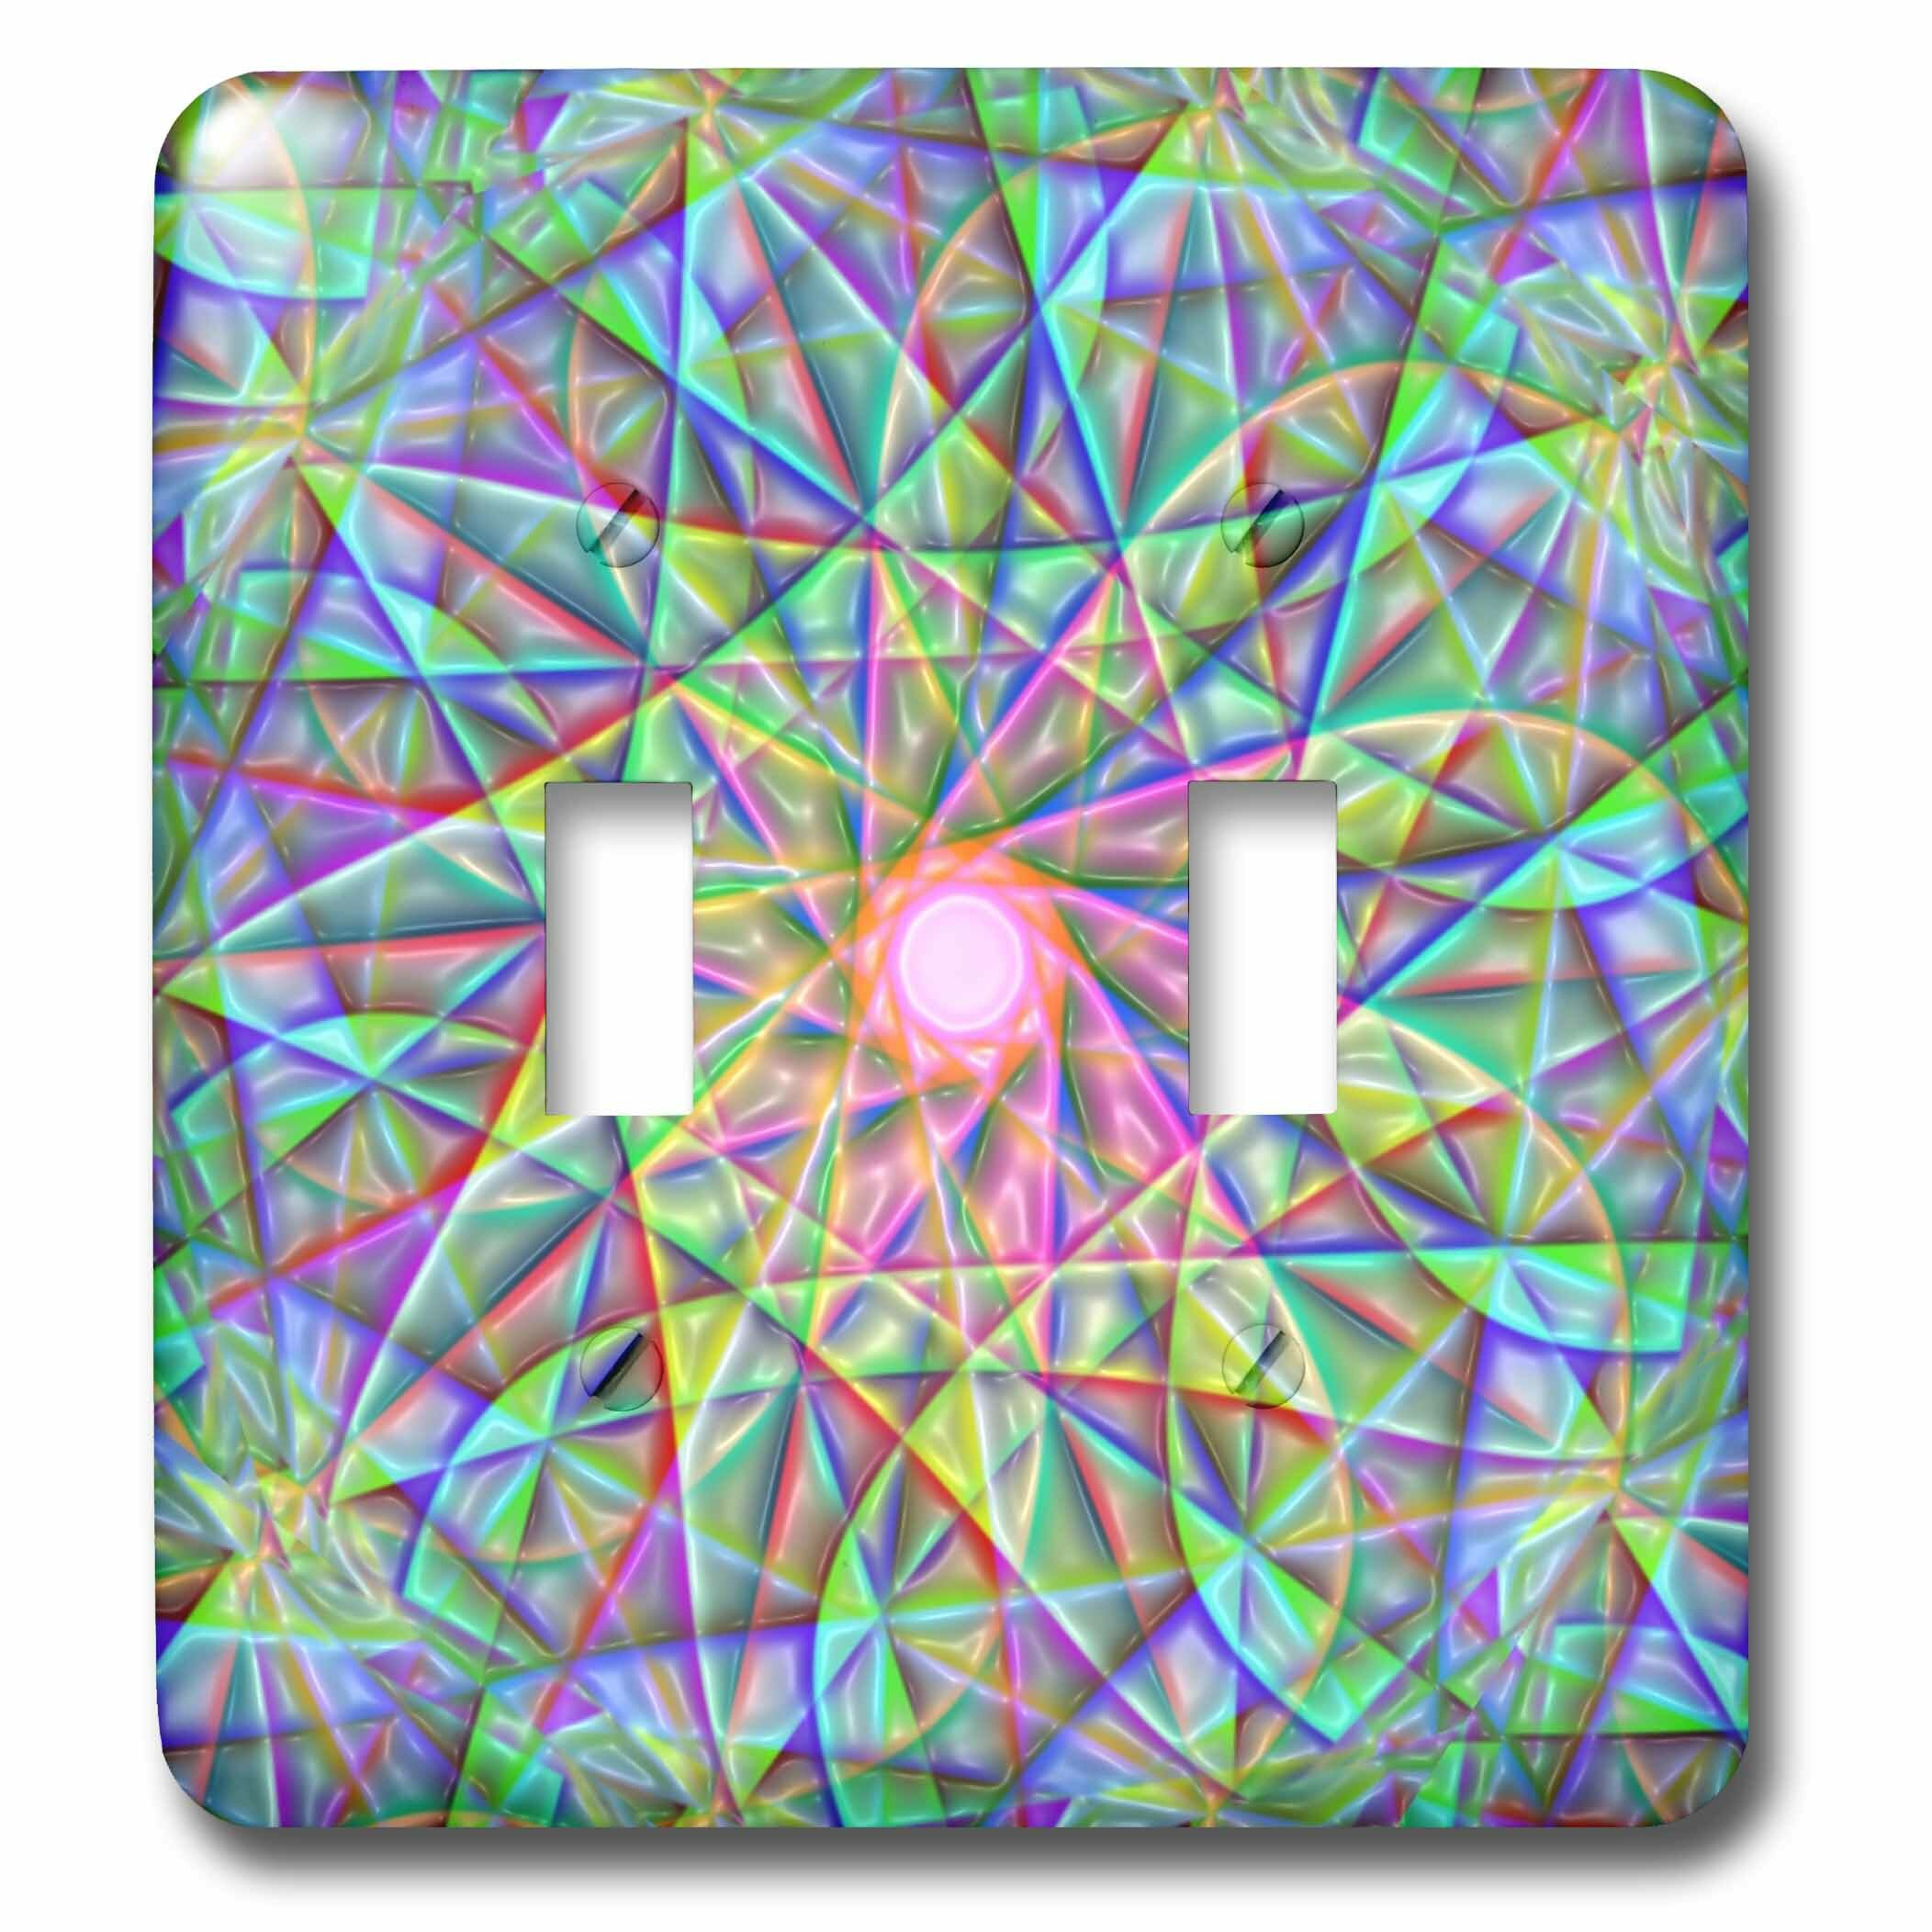 3drose Digital Abstract 2 Gang Toggle Light Switch Wall Plate Wayfair